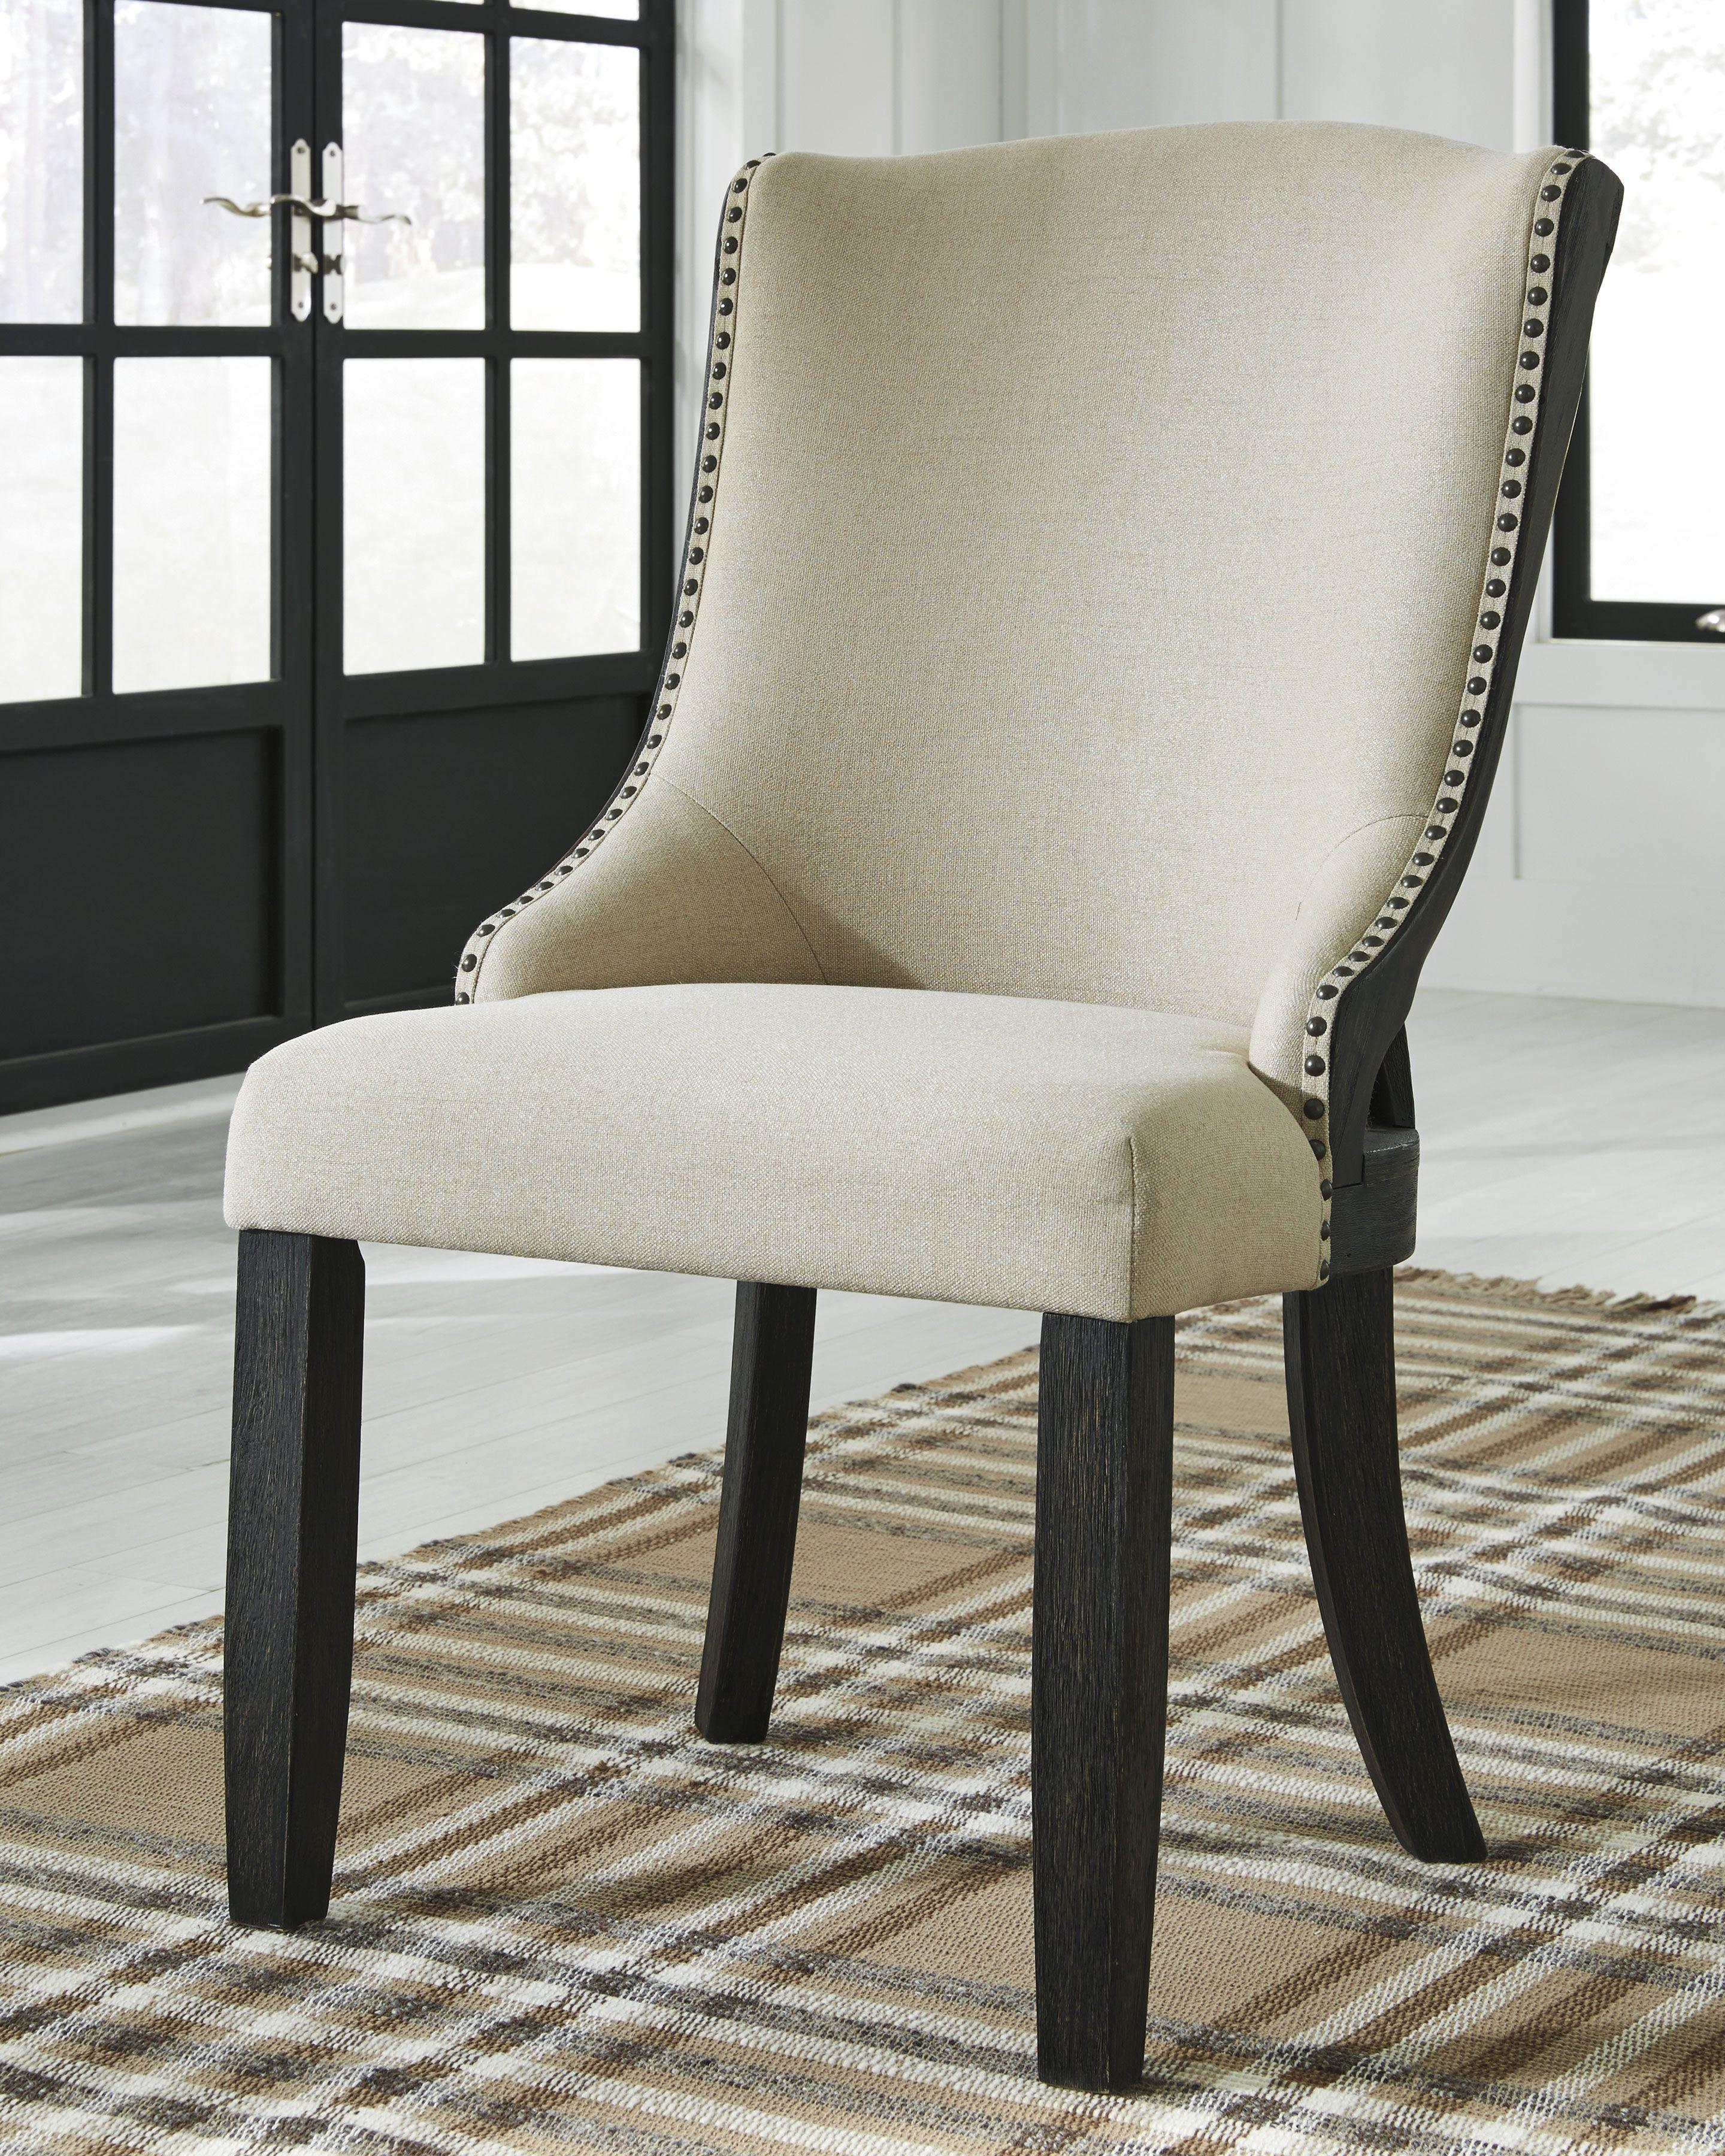 Grindleburg Dining Room Chair Set Of 2 Black Tan